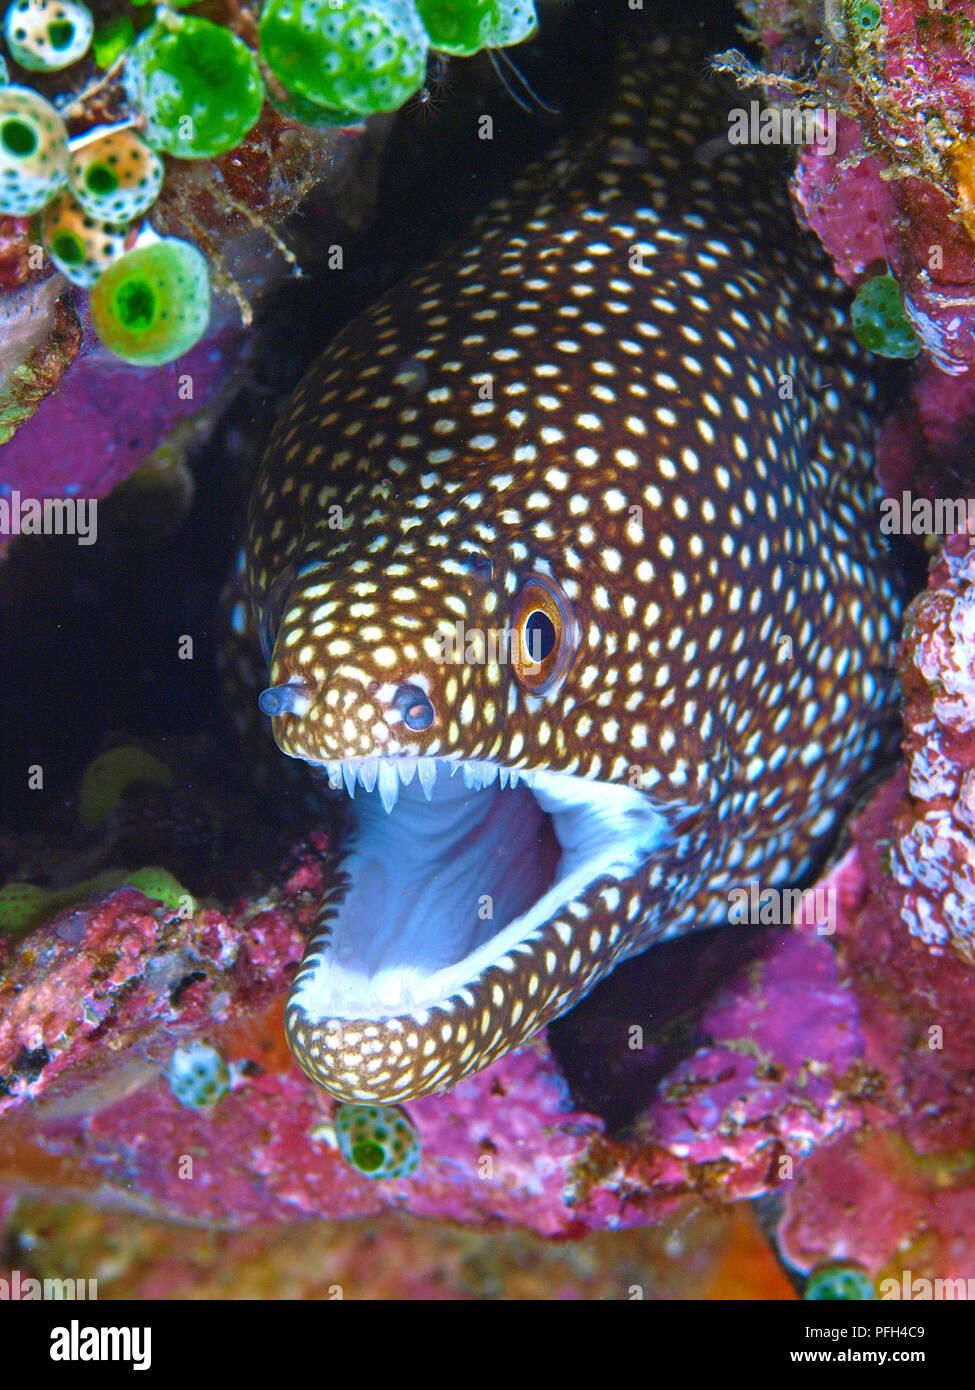 Weissmaulmuraene (Gymnothorax meleagris), offenes Maul, Ari Atoll, Malediven | Whitemouth Moray (Gymnothorax melearis), open mouth, Maldive islands Stock Photo